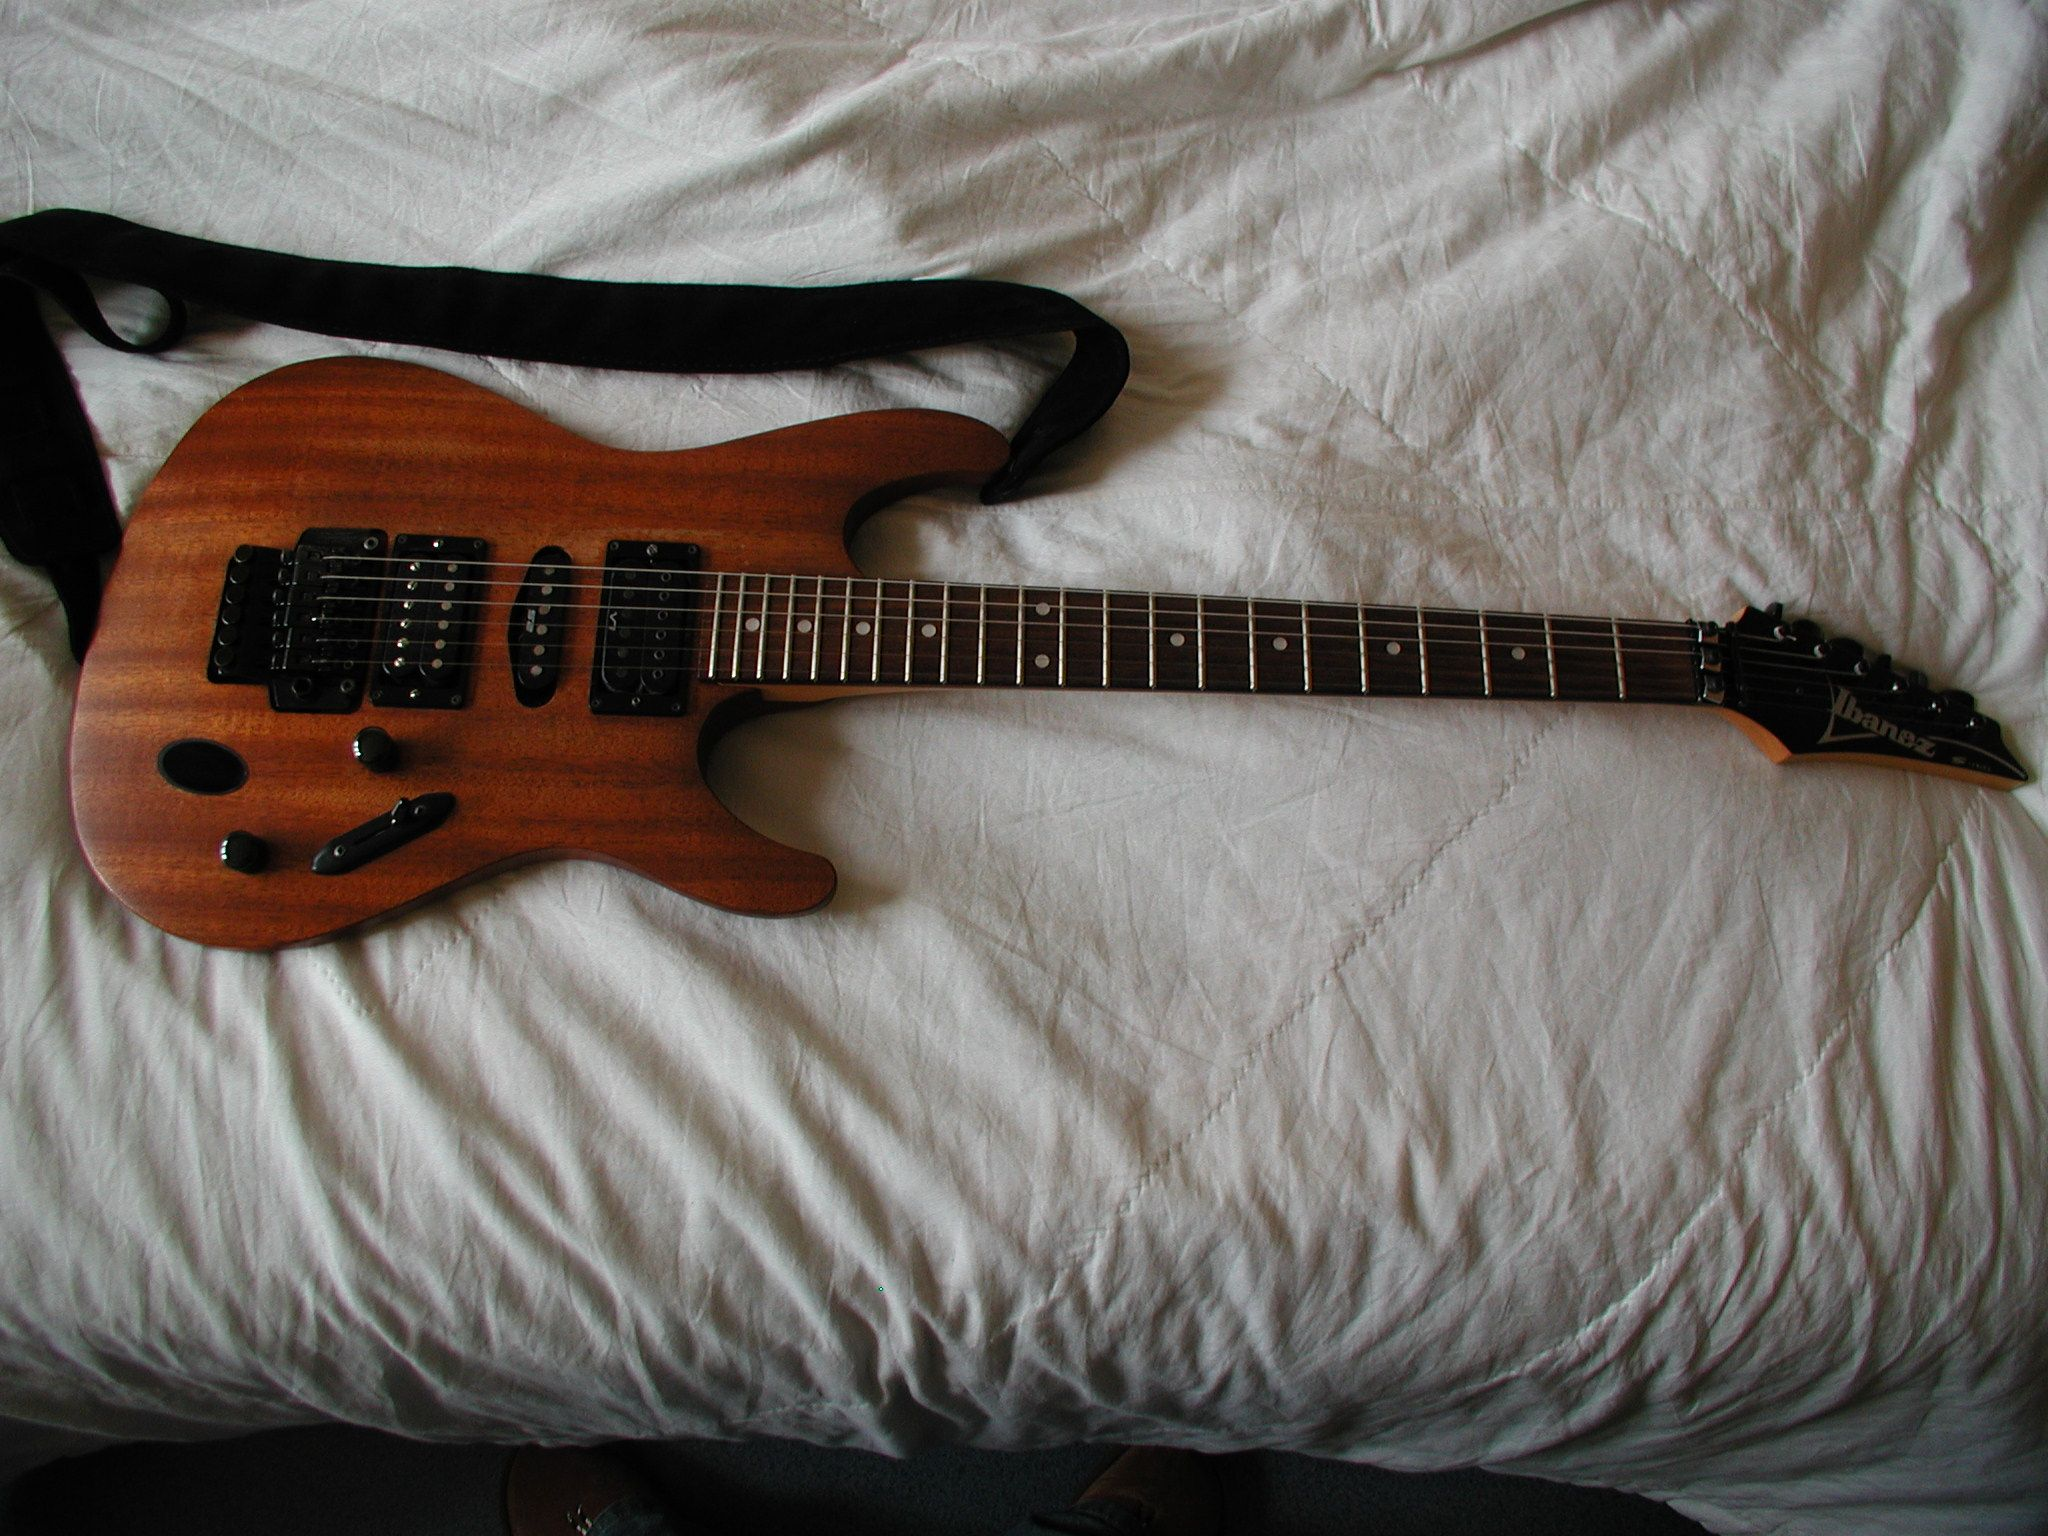 Ibanez S470 beeaaaautiful   Guitars   Pinterest   Ibanez, Guitars ...